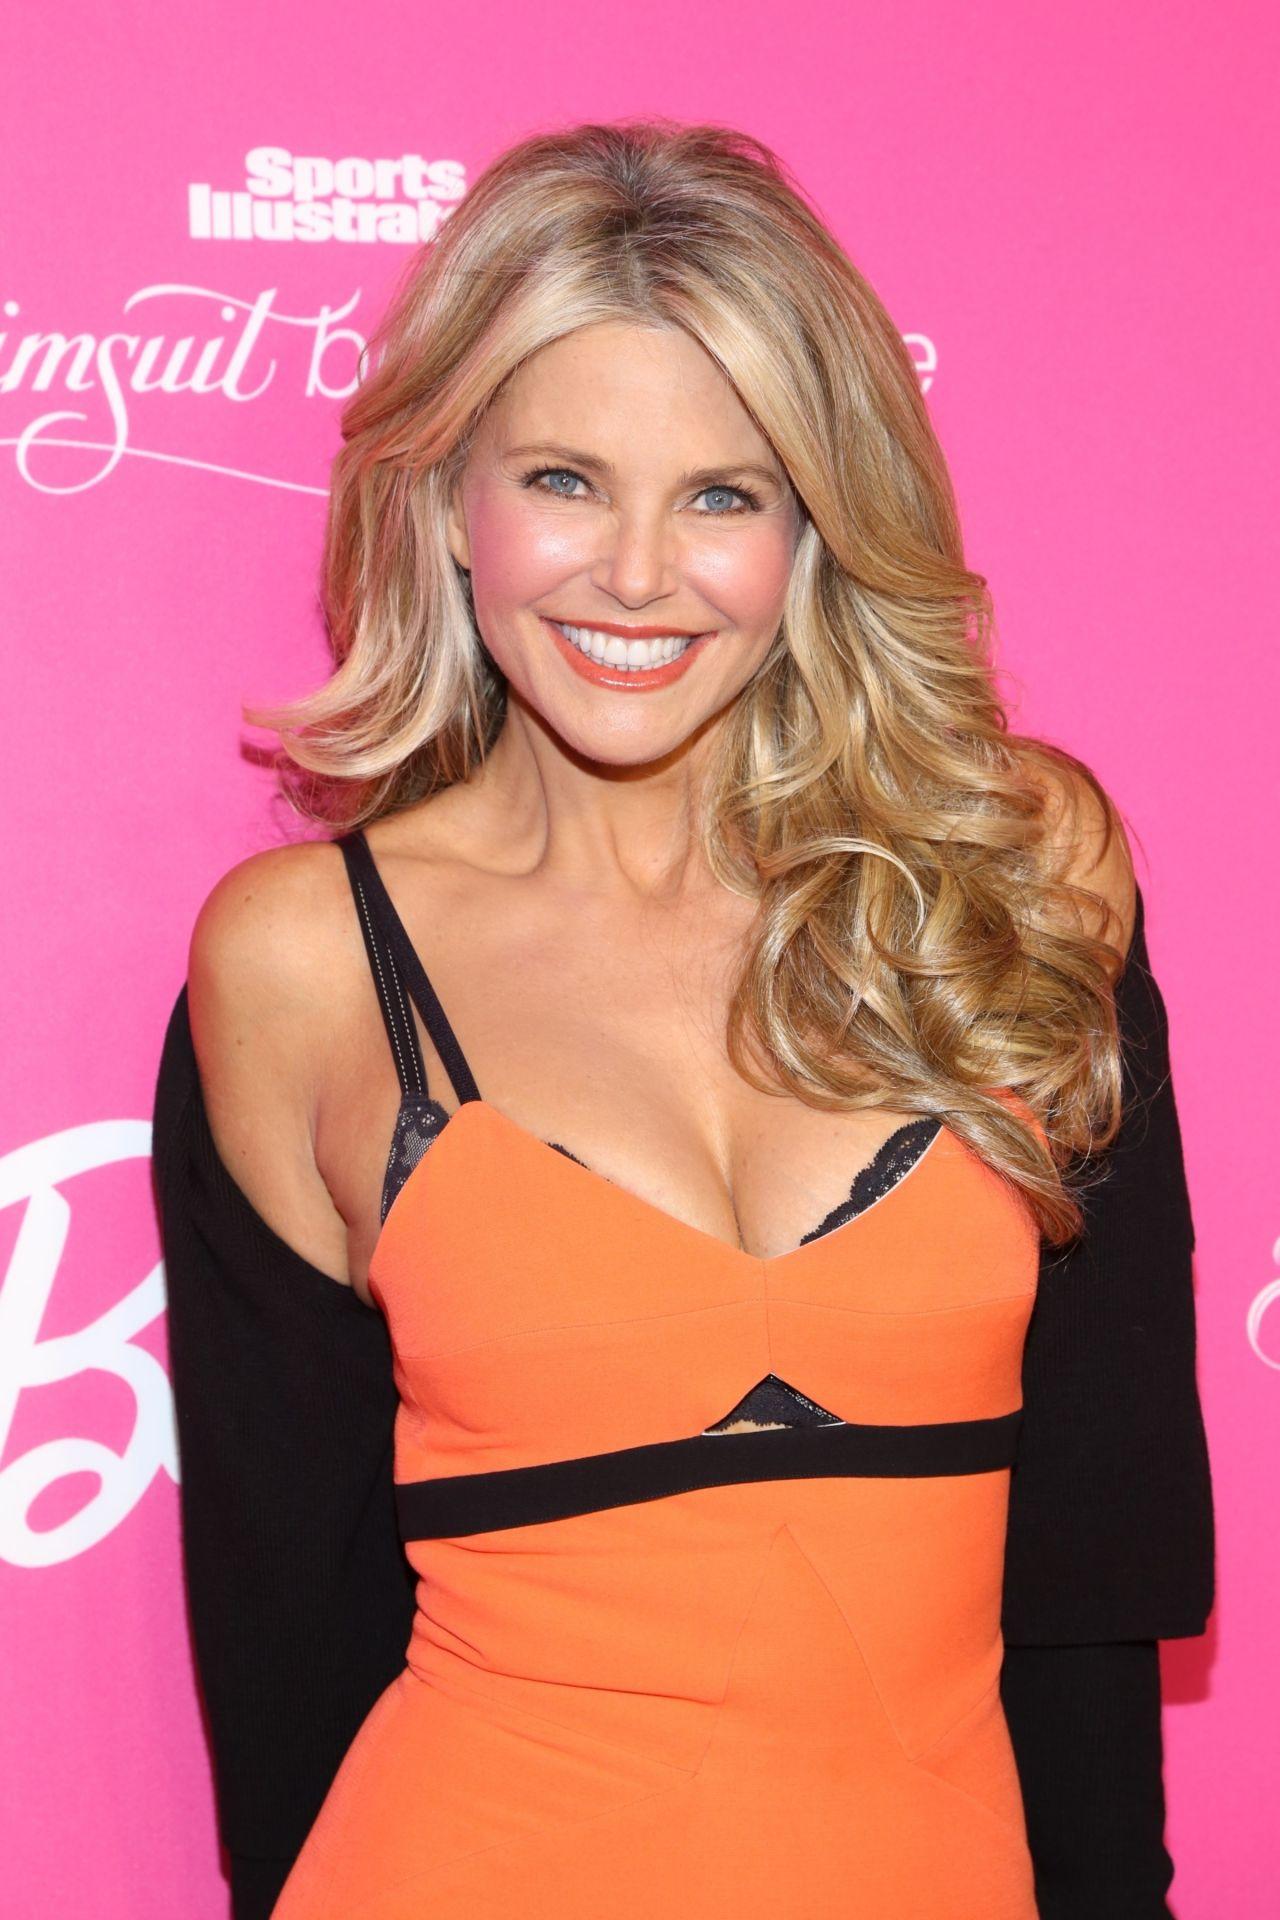 Heidi Klum Sports Illustrated 2014